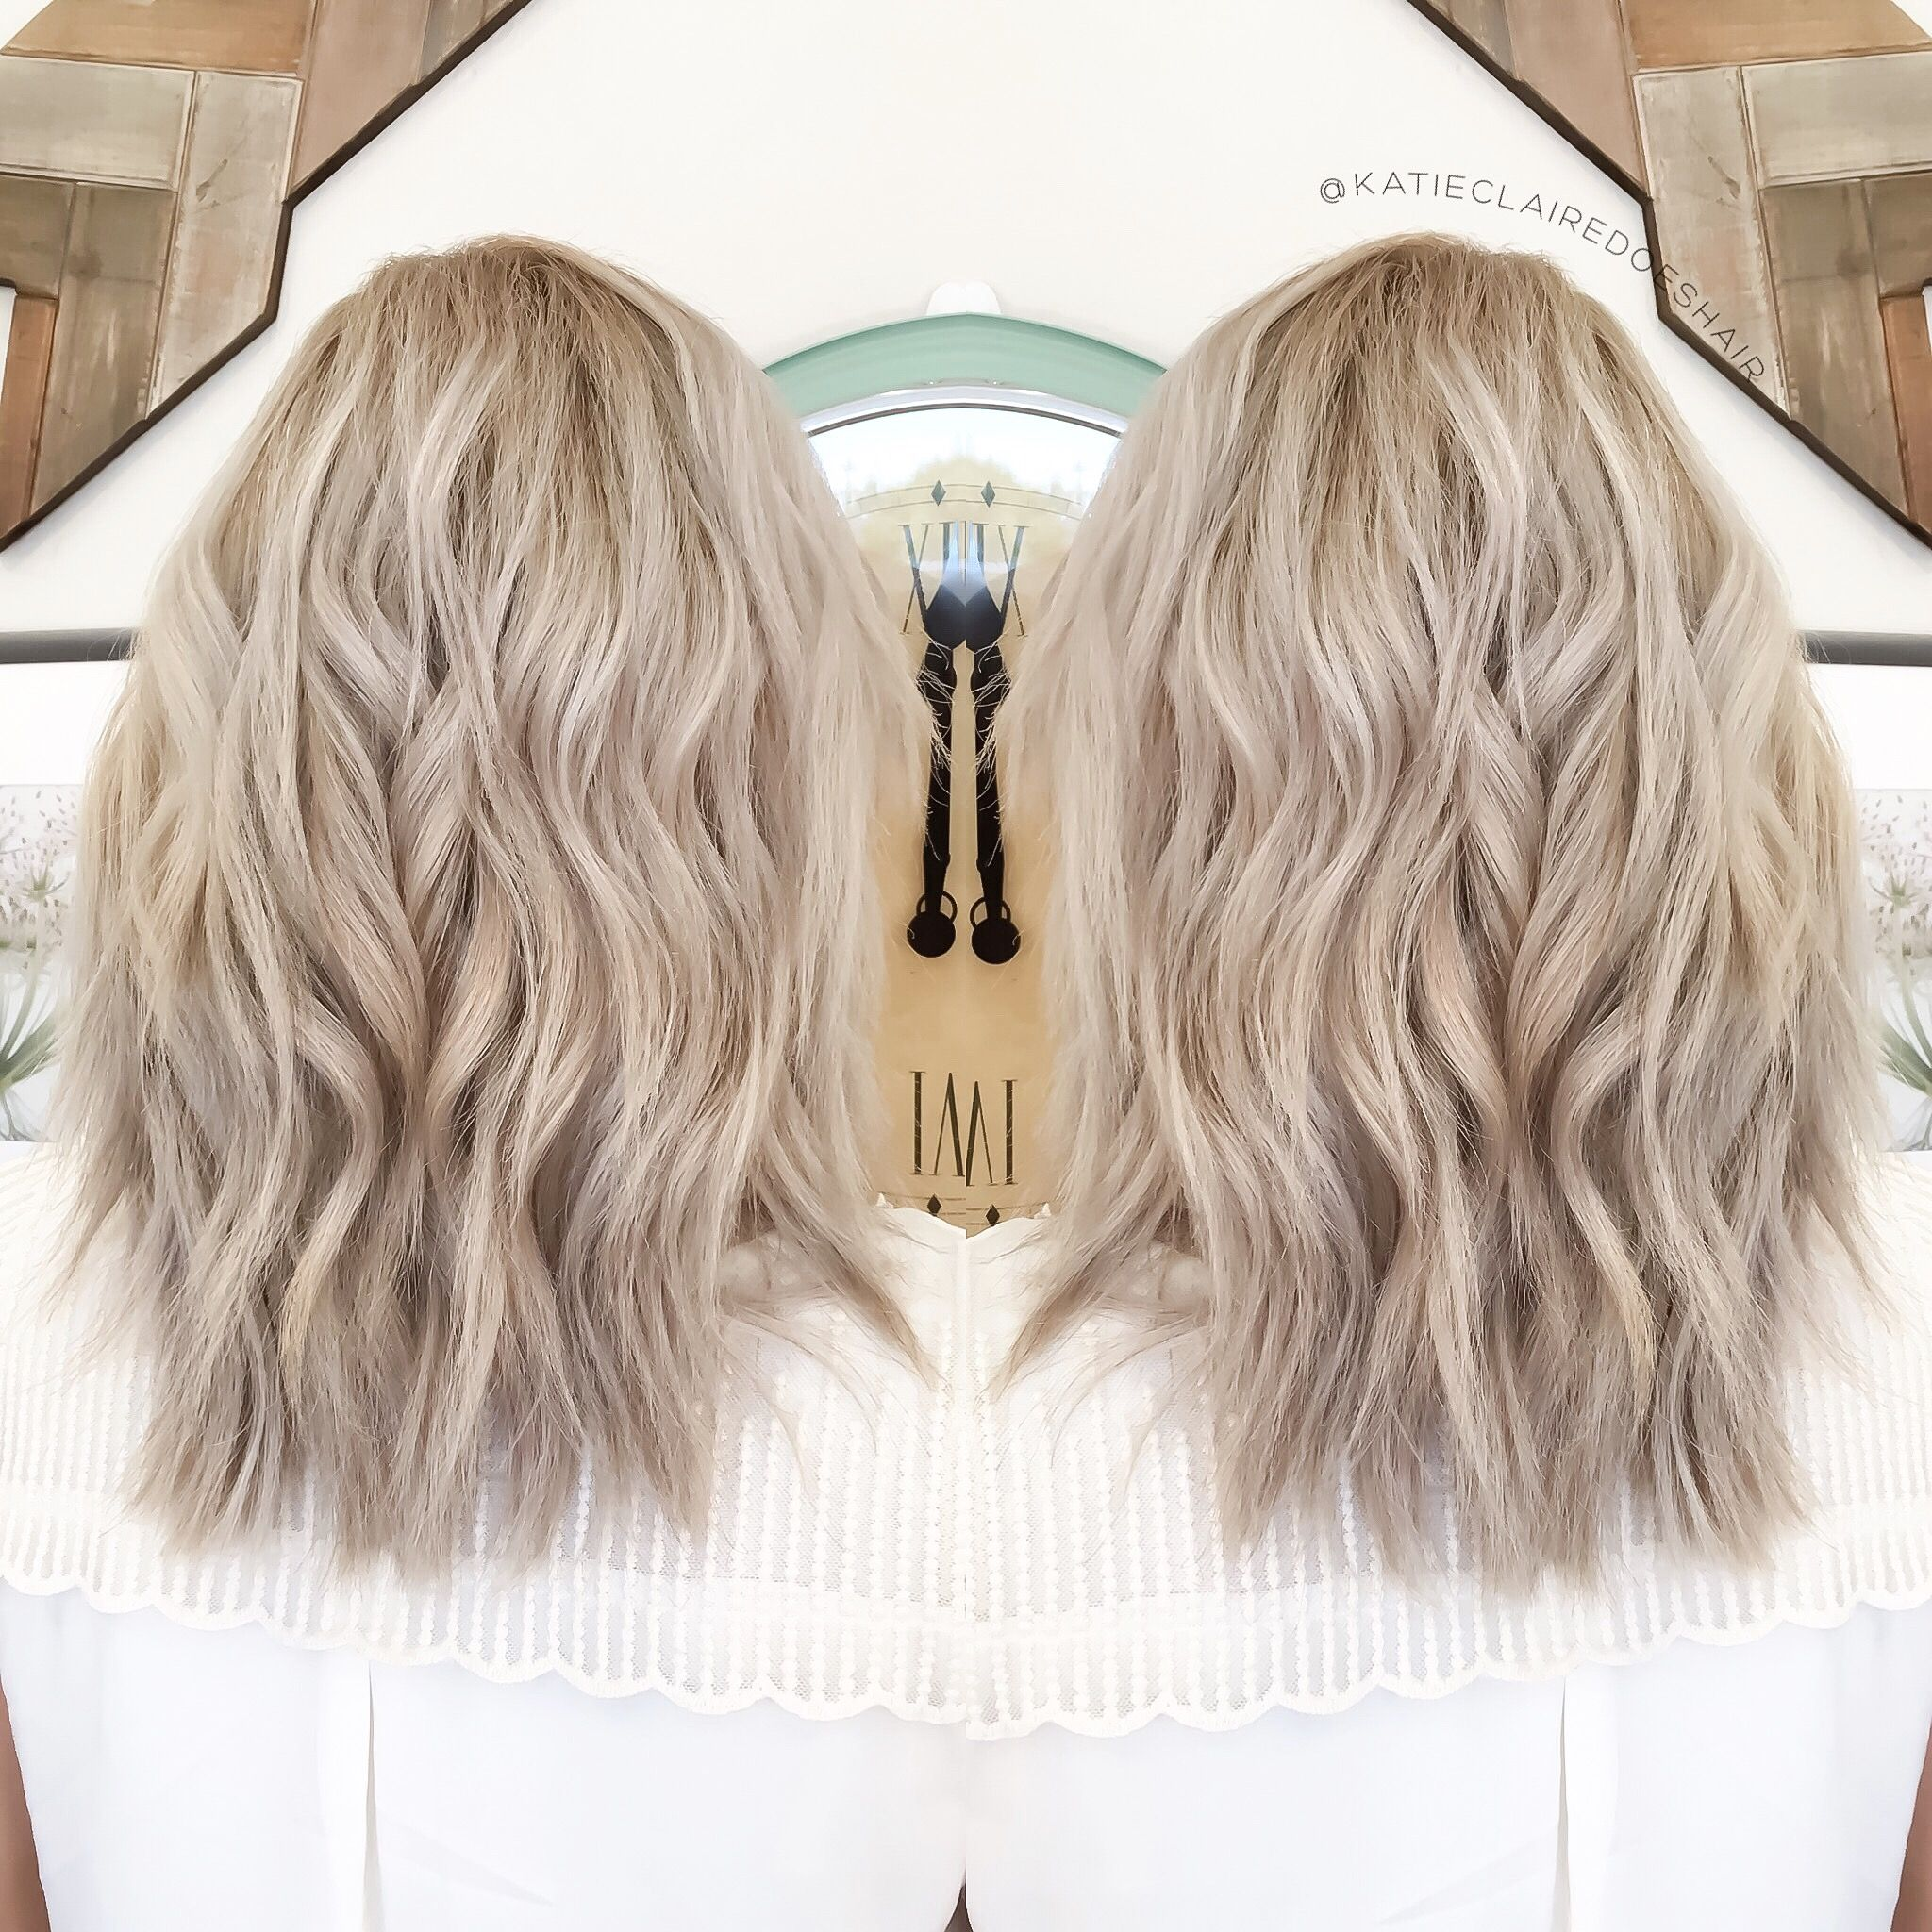 Ashy blonde// olaplex // ash blonde // cool blonde #naturalashblonde